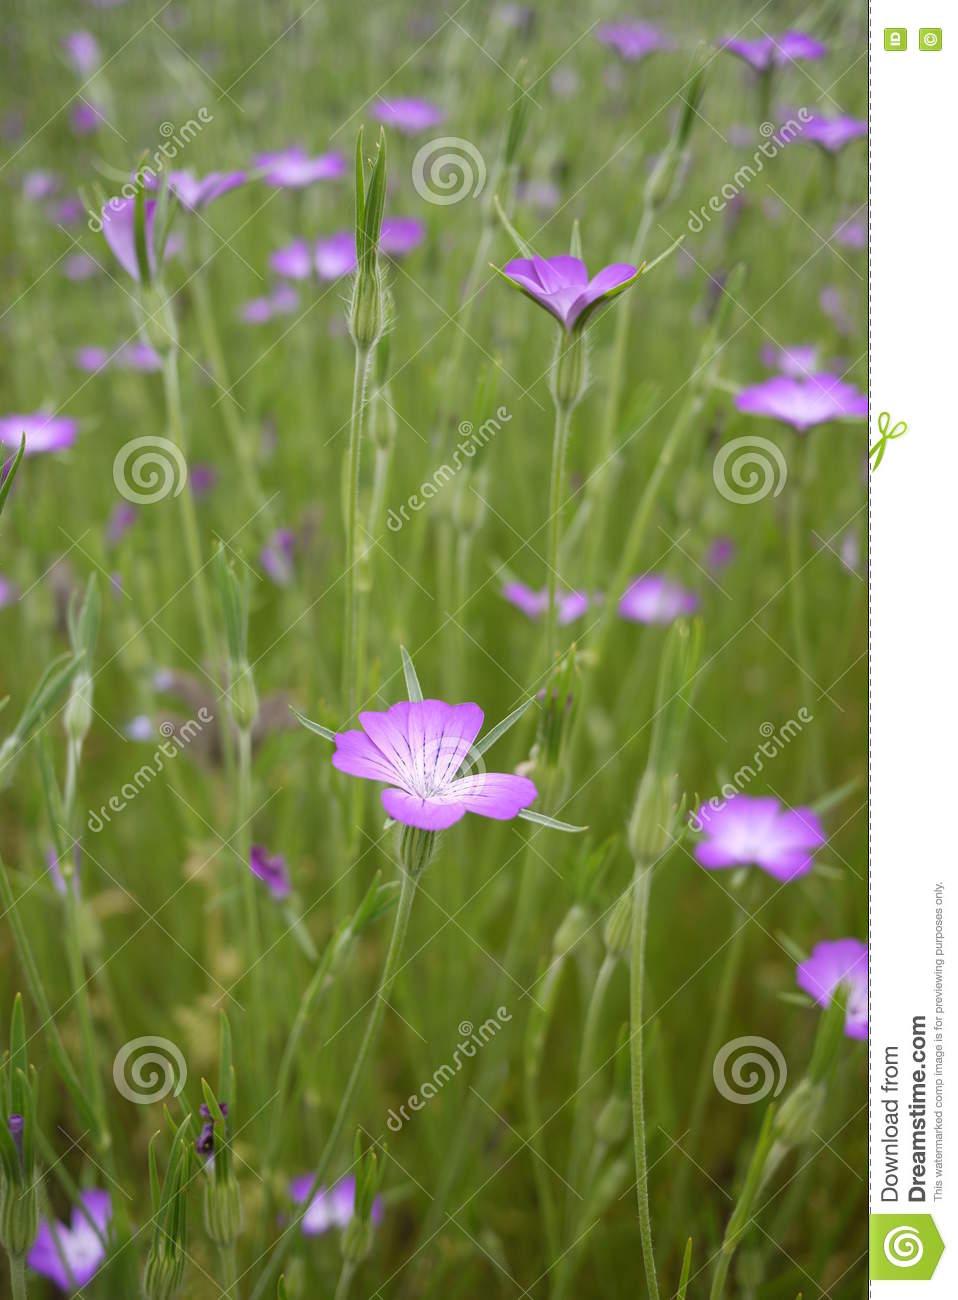 Corncockle Wild Pink Flower On Mass Stock Photo.